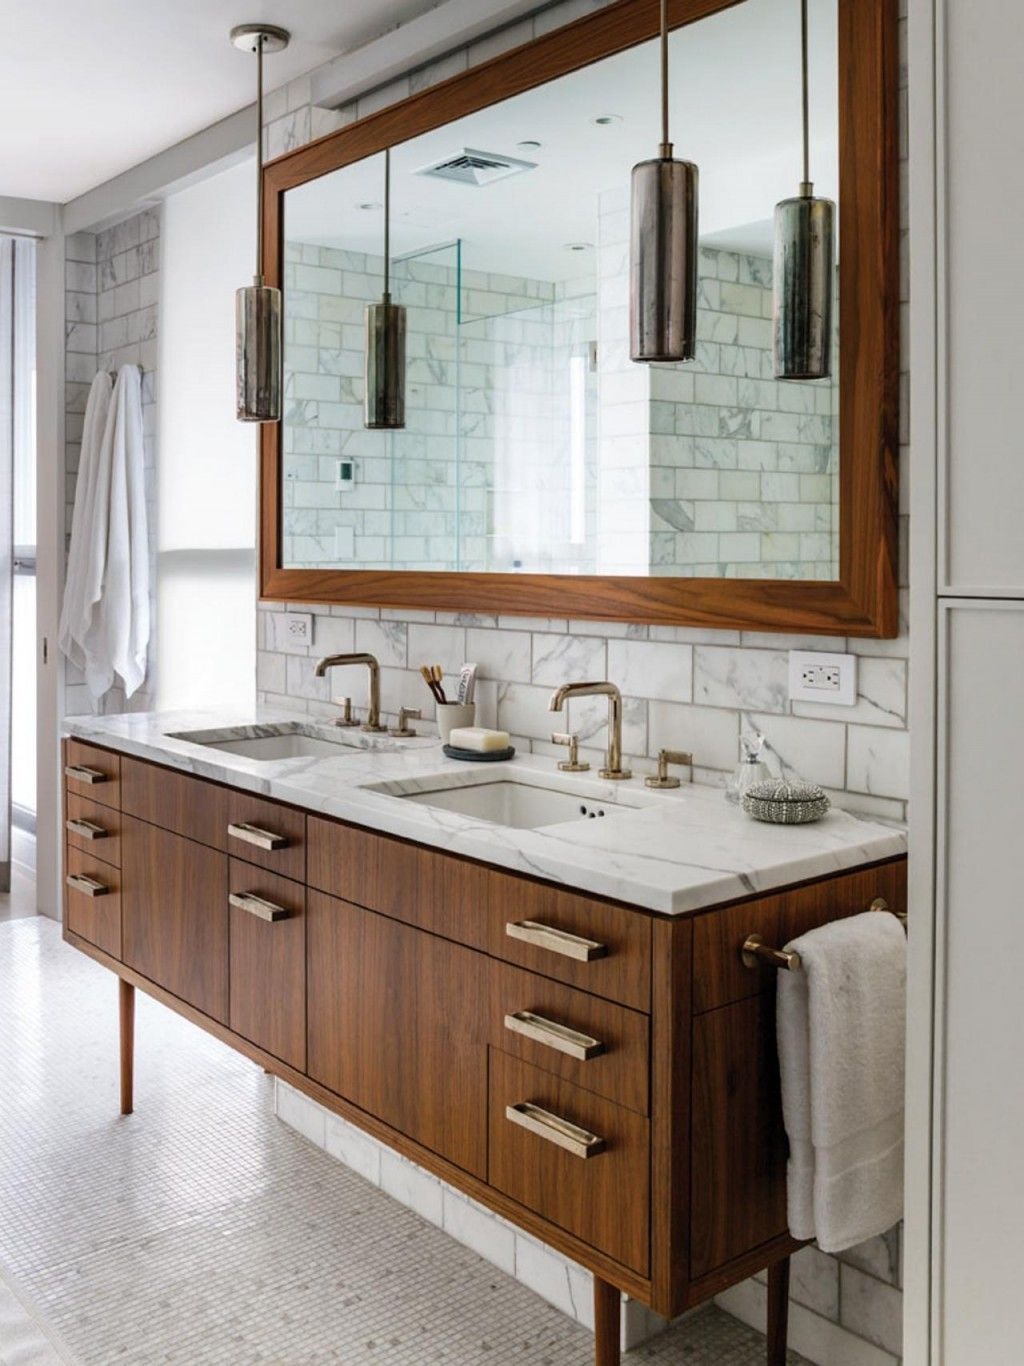 Bathroom Bathroom Teak Vanity With White Marble Vanity Top Also Double Square Undermount Sink An Stylish Bathroom Mid Century Modern Bathroom Modern Bathroom